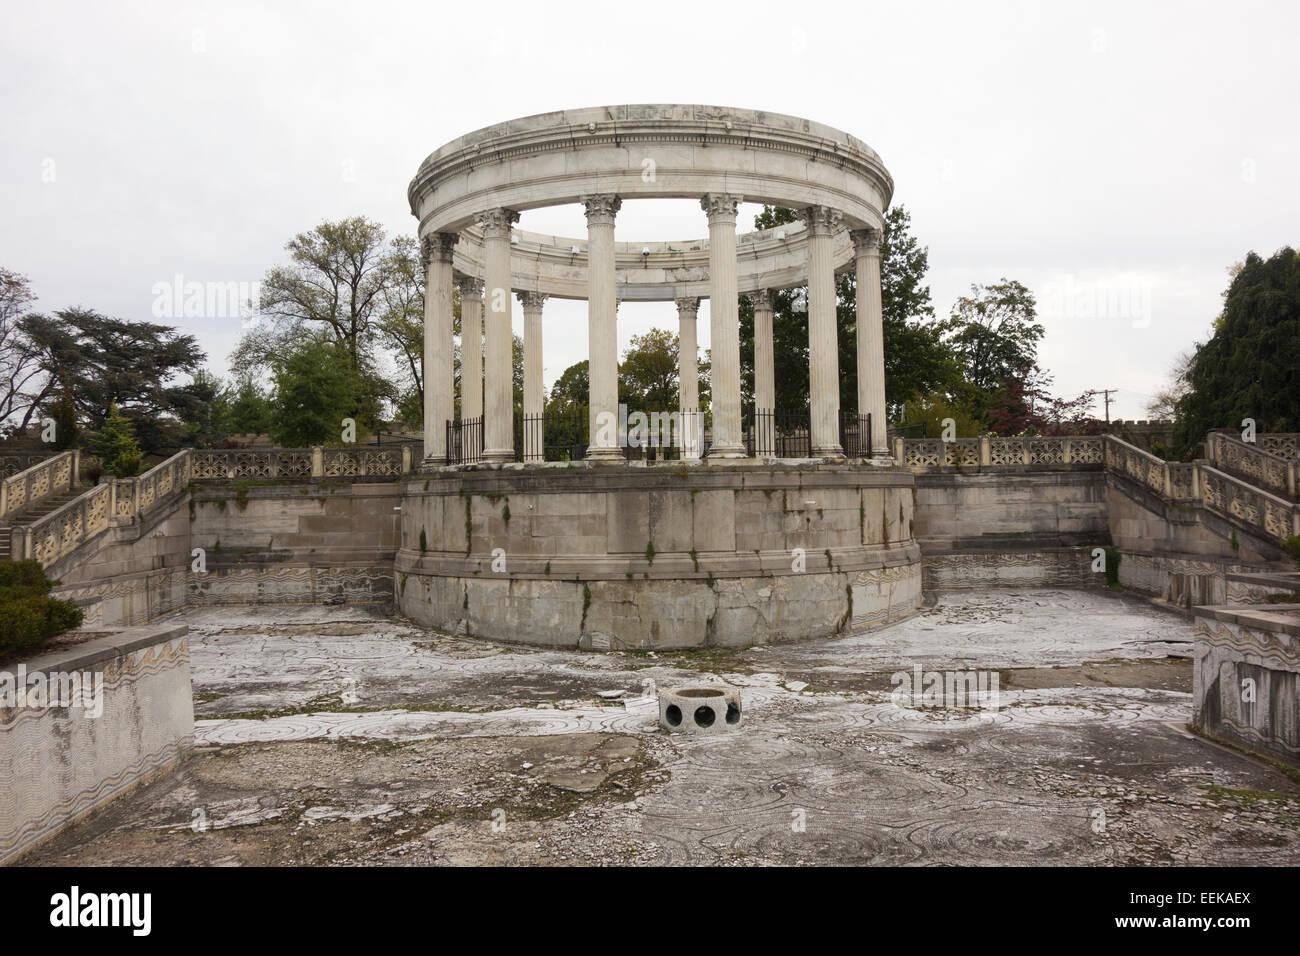 Untermyer Gardens Conservancy In Yonkers Ny Stock Photo 77872002